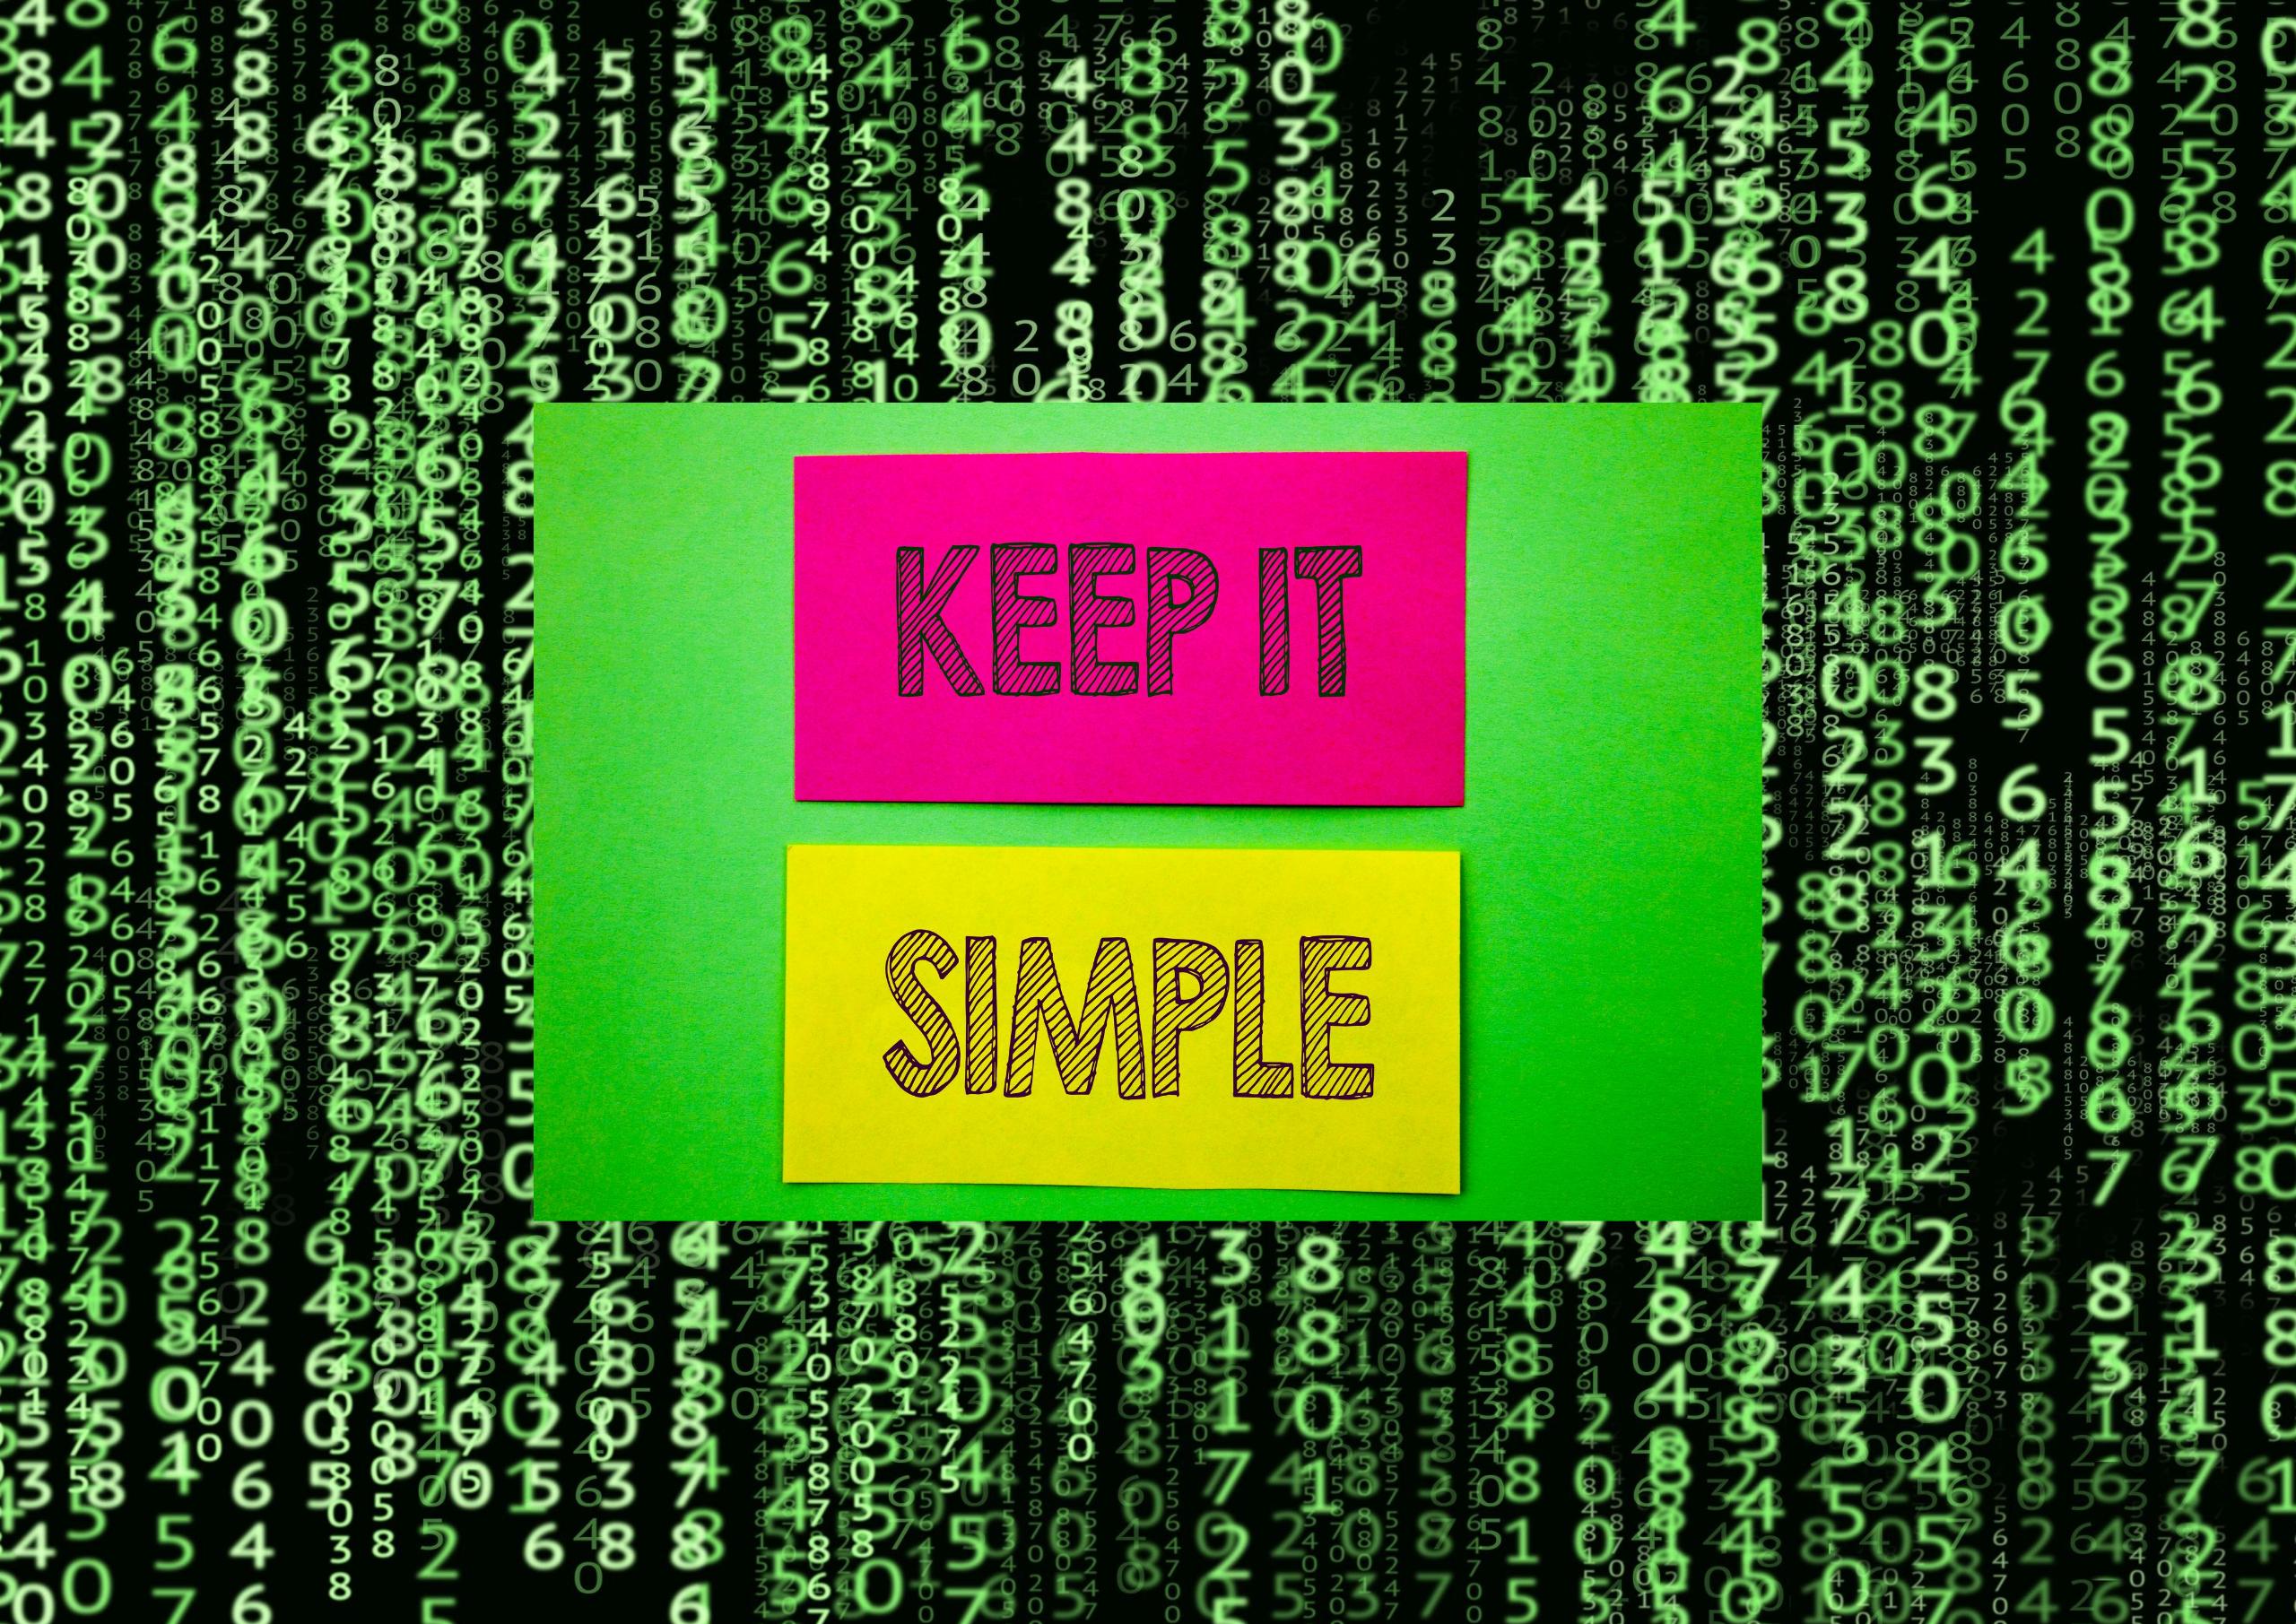 Keep-it-simple-sized